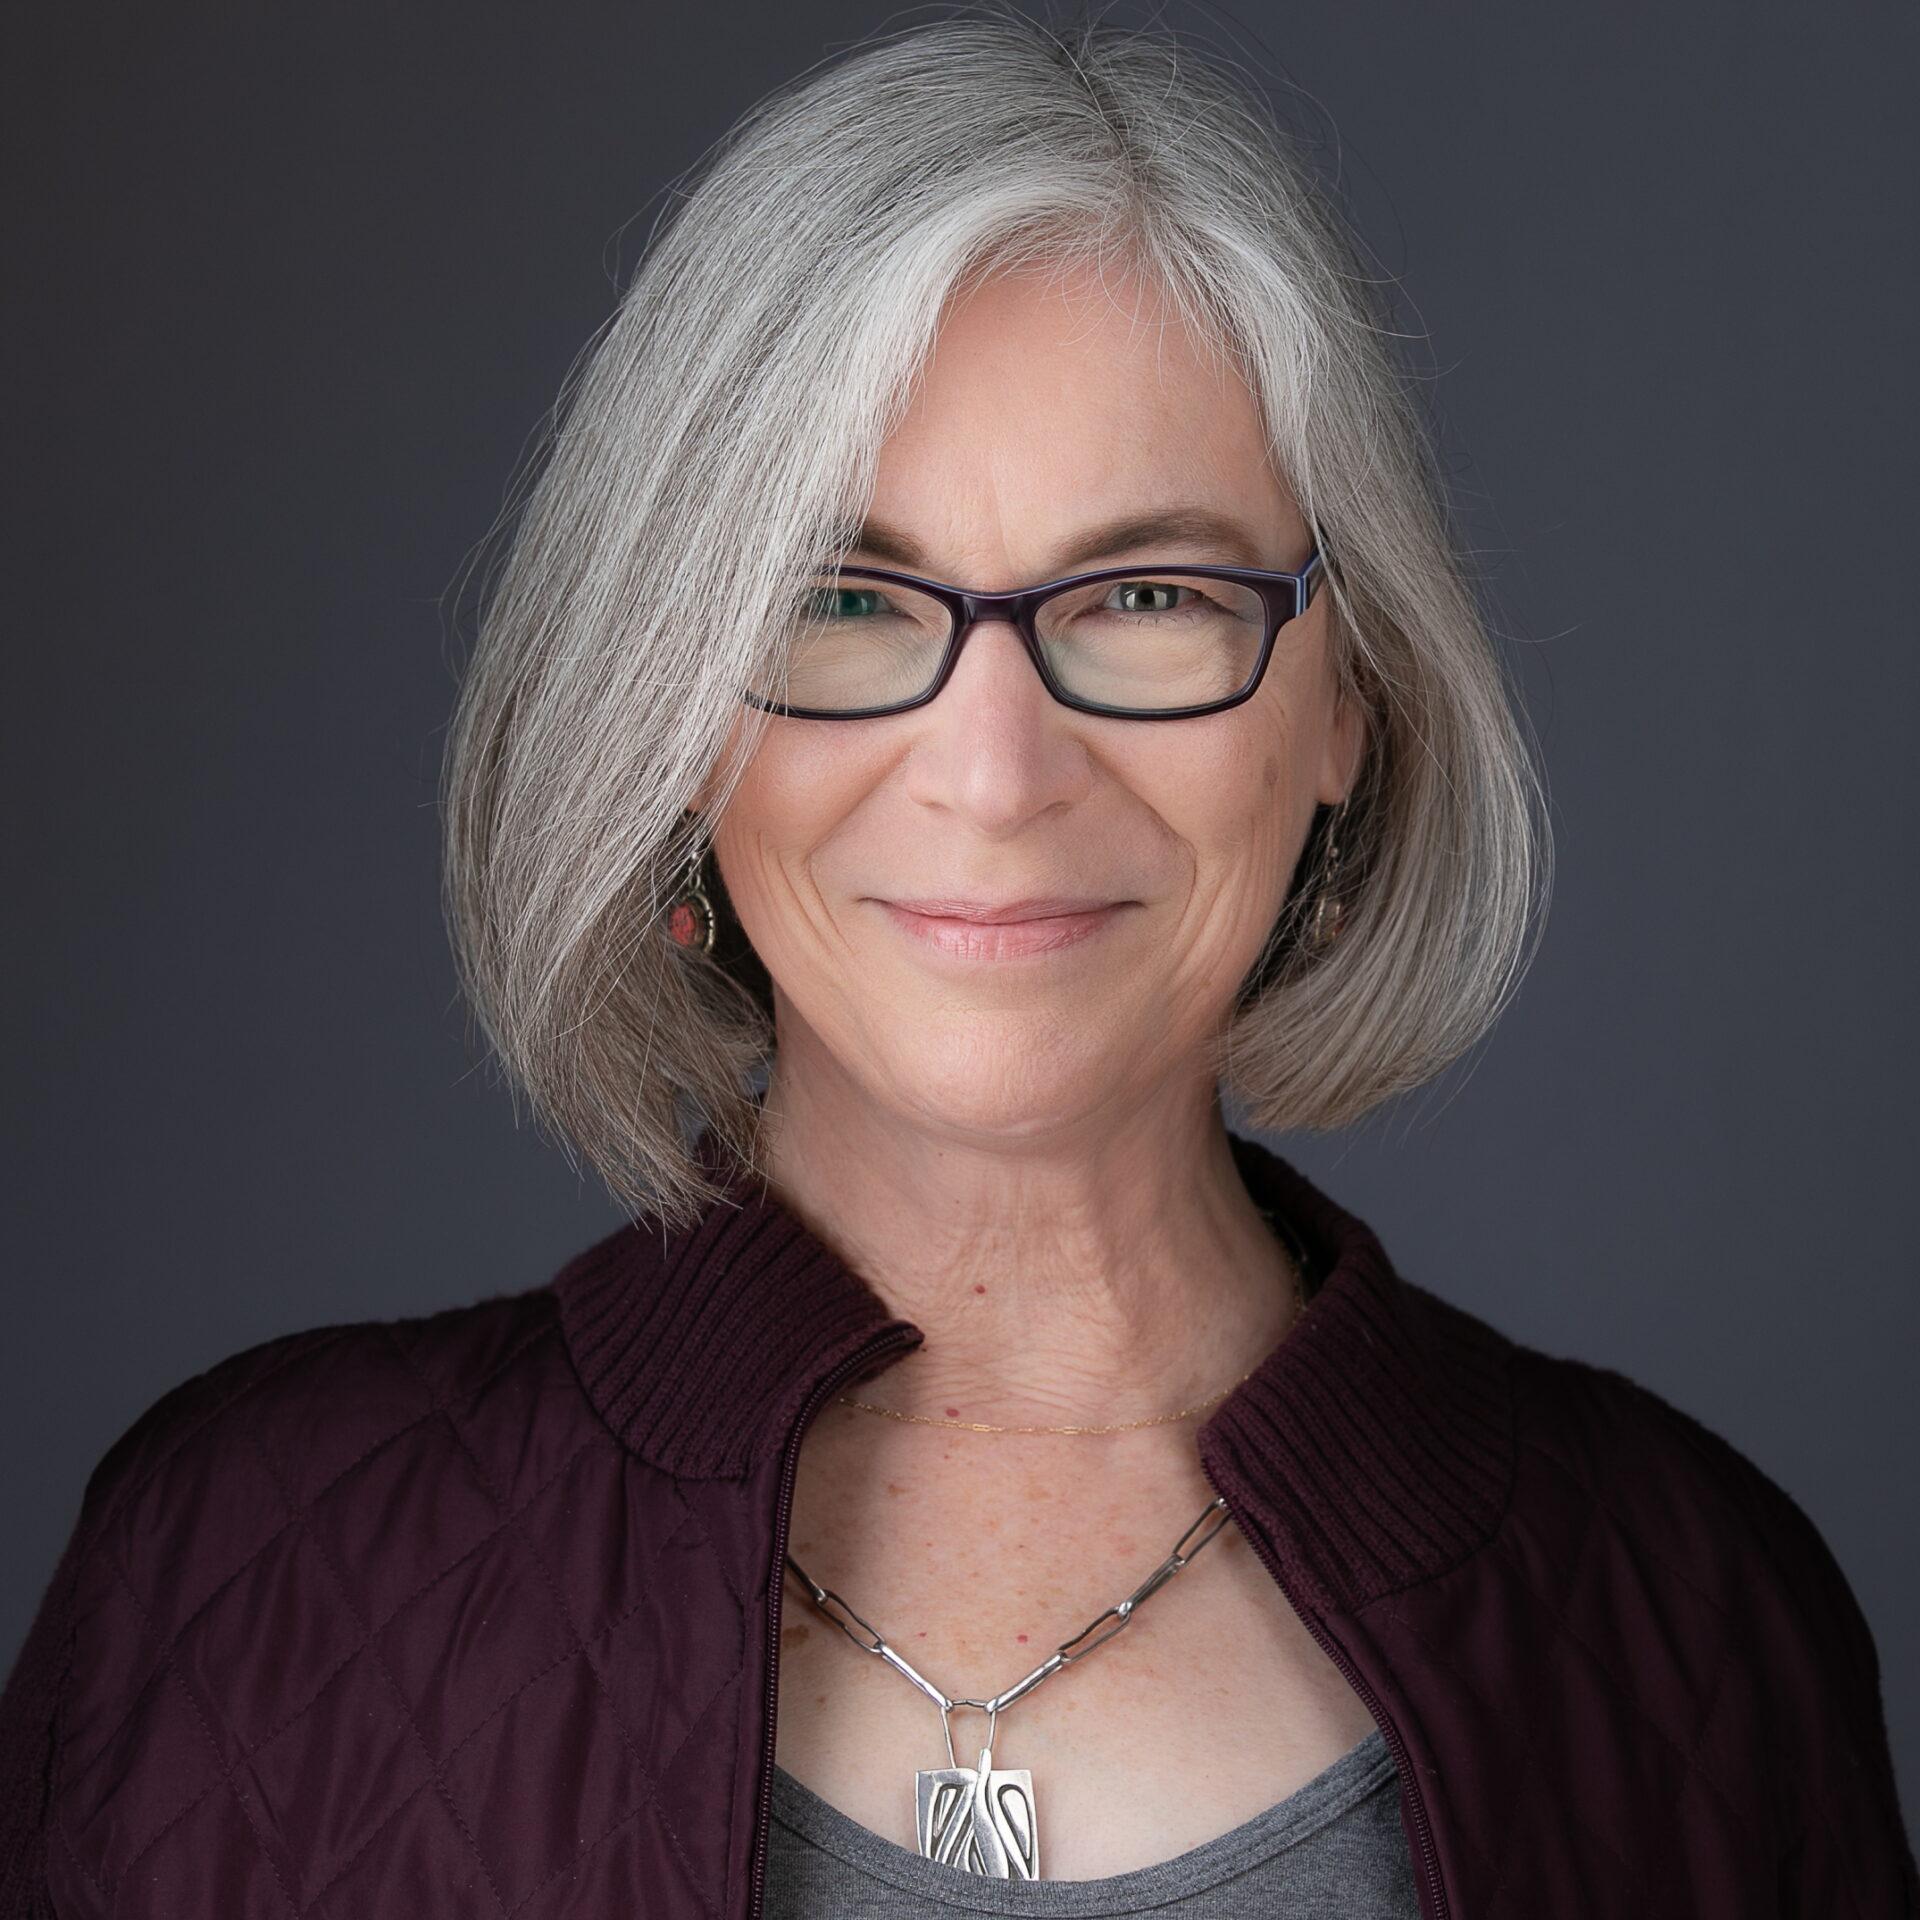 Kathryn Goldman